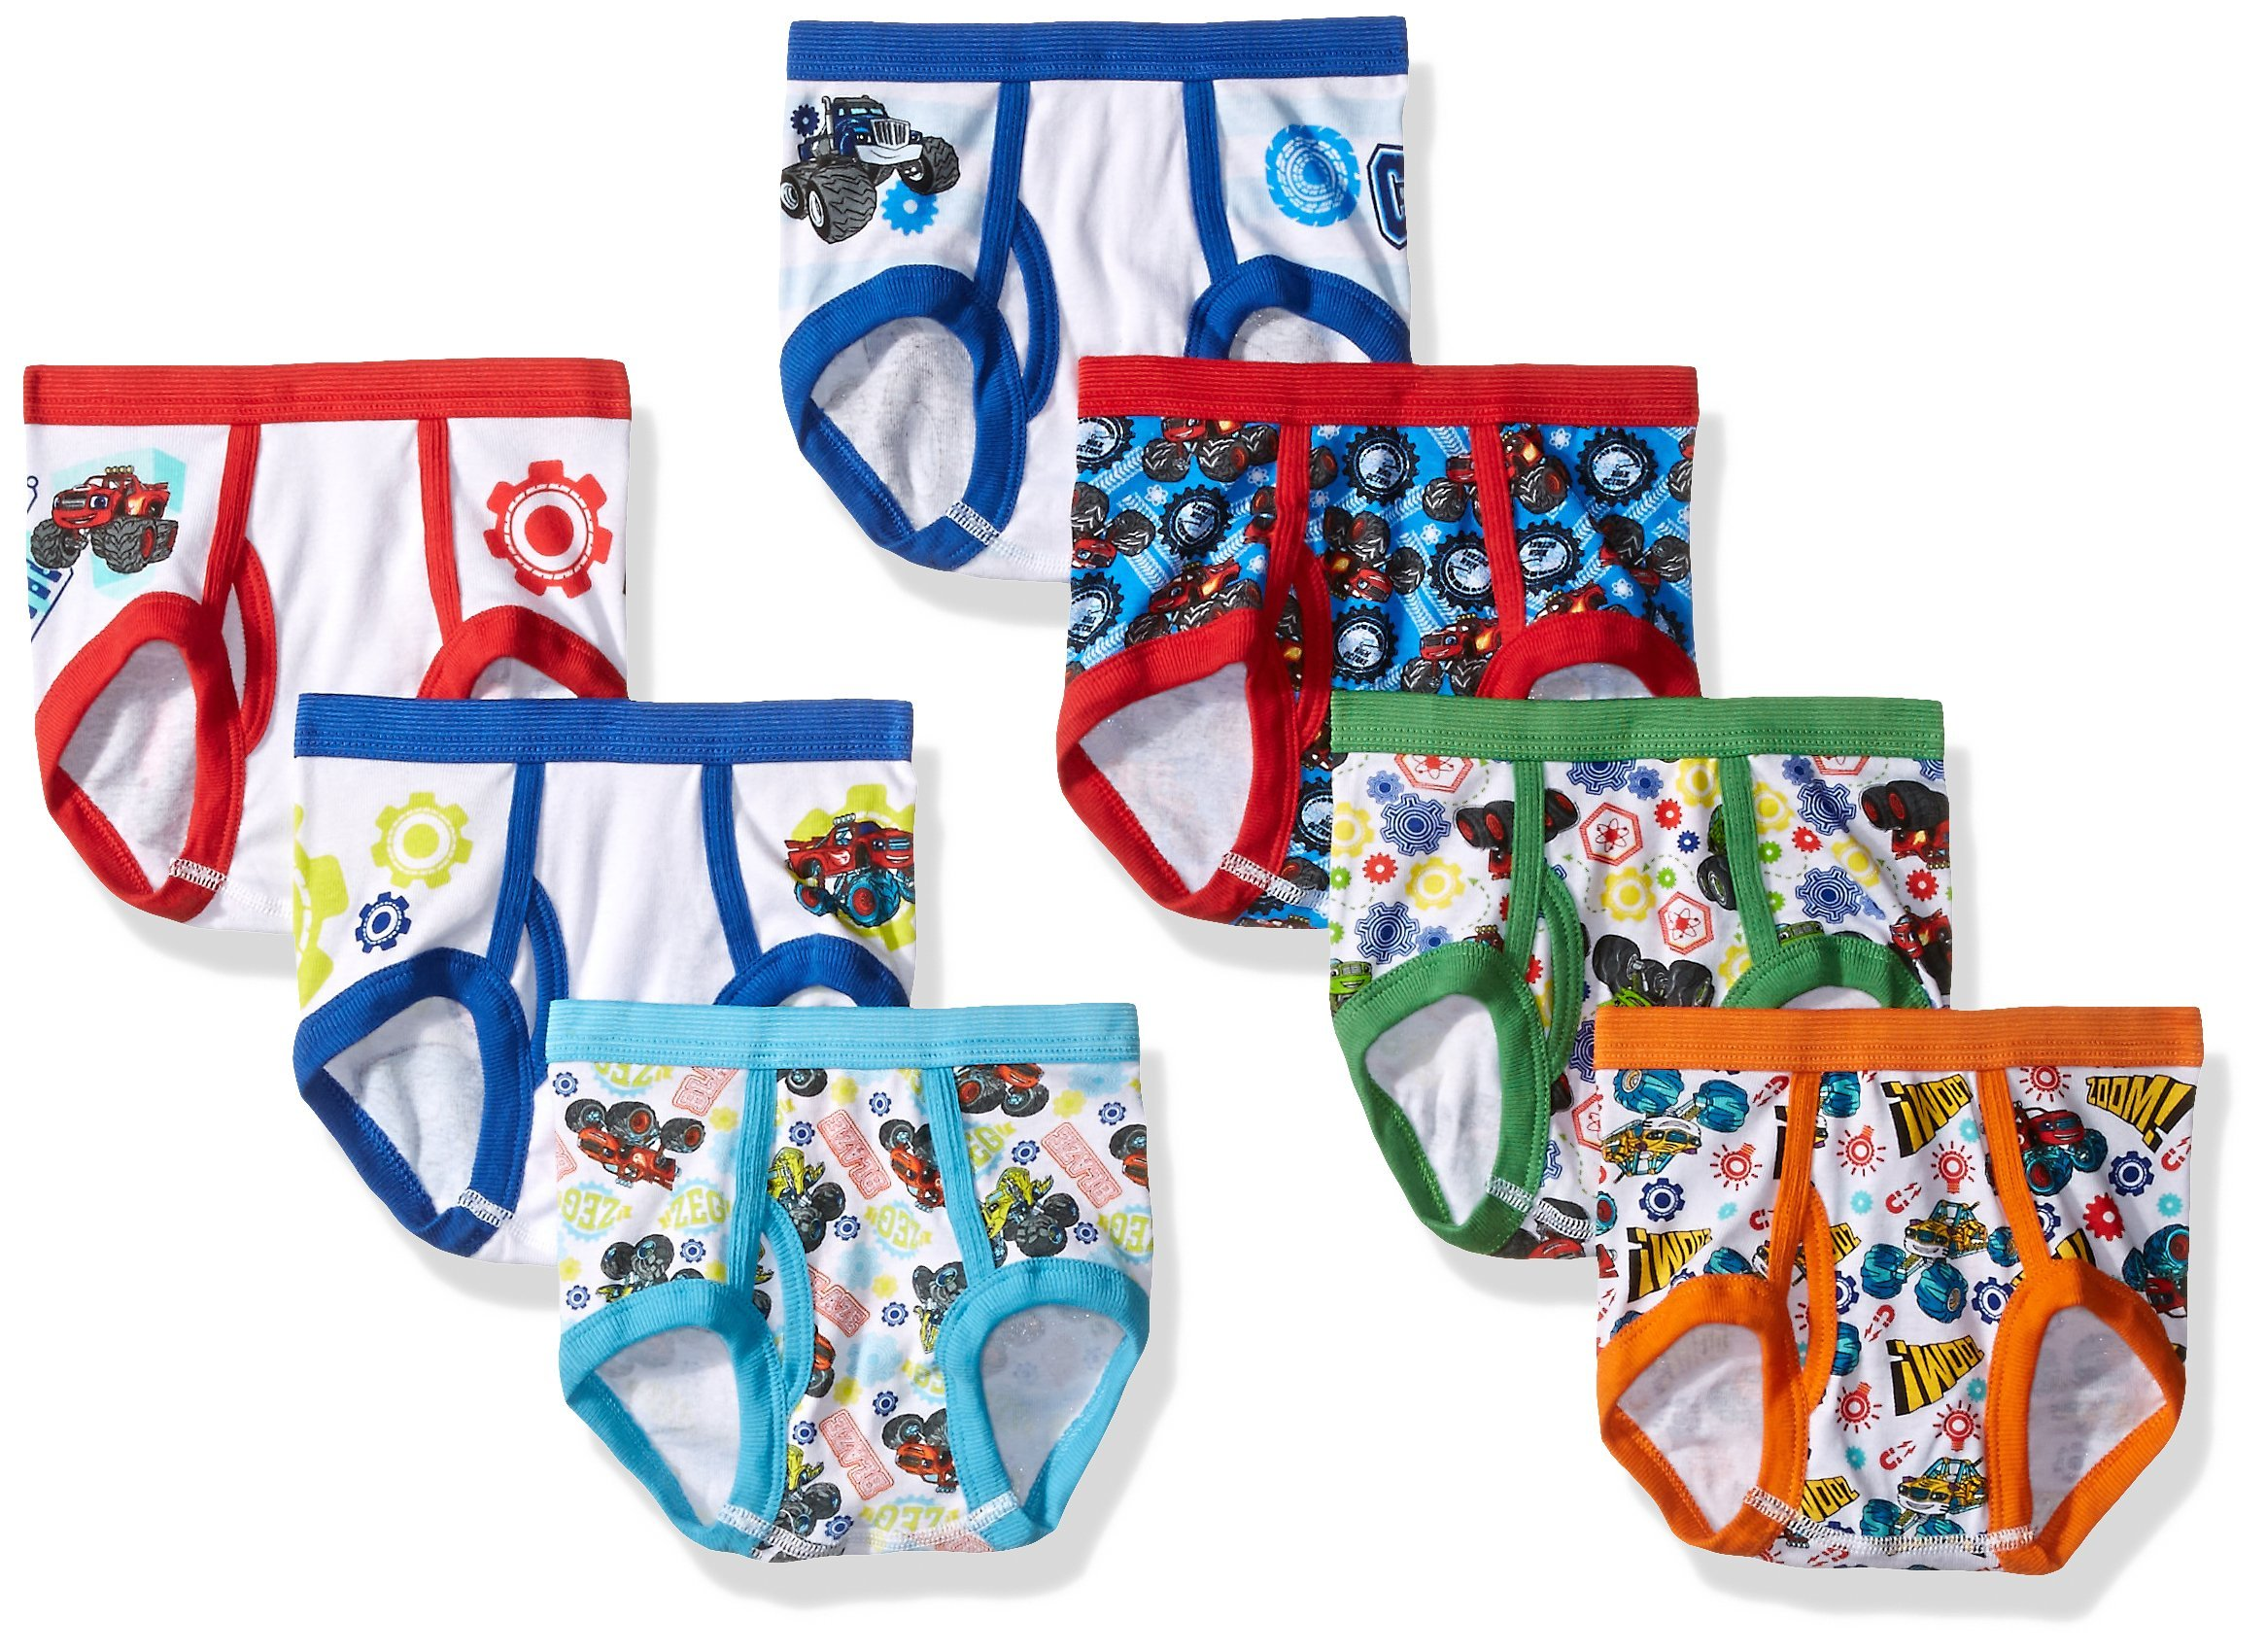 Nickelodeon Boys' Toddler 7pk Underwear, Assorted, 4T